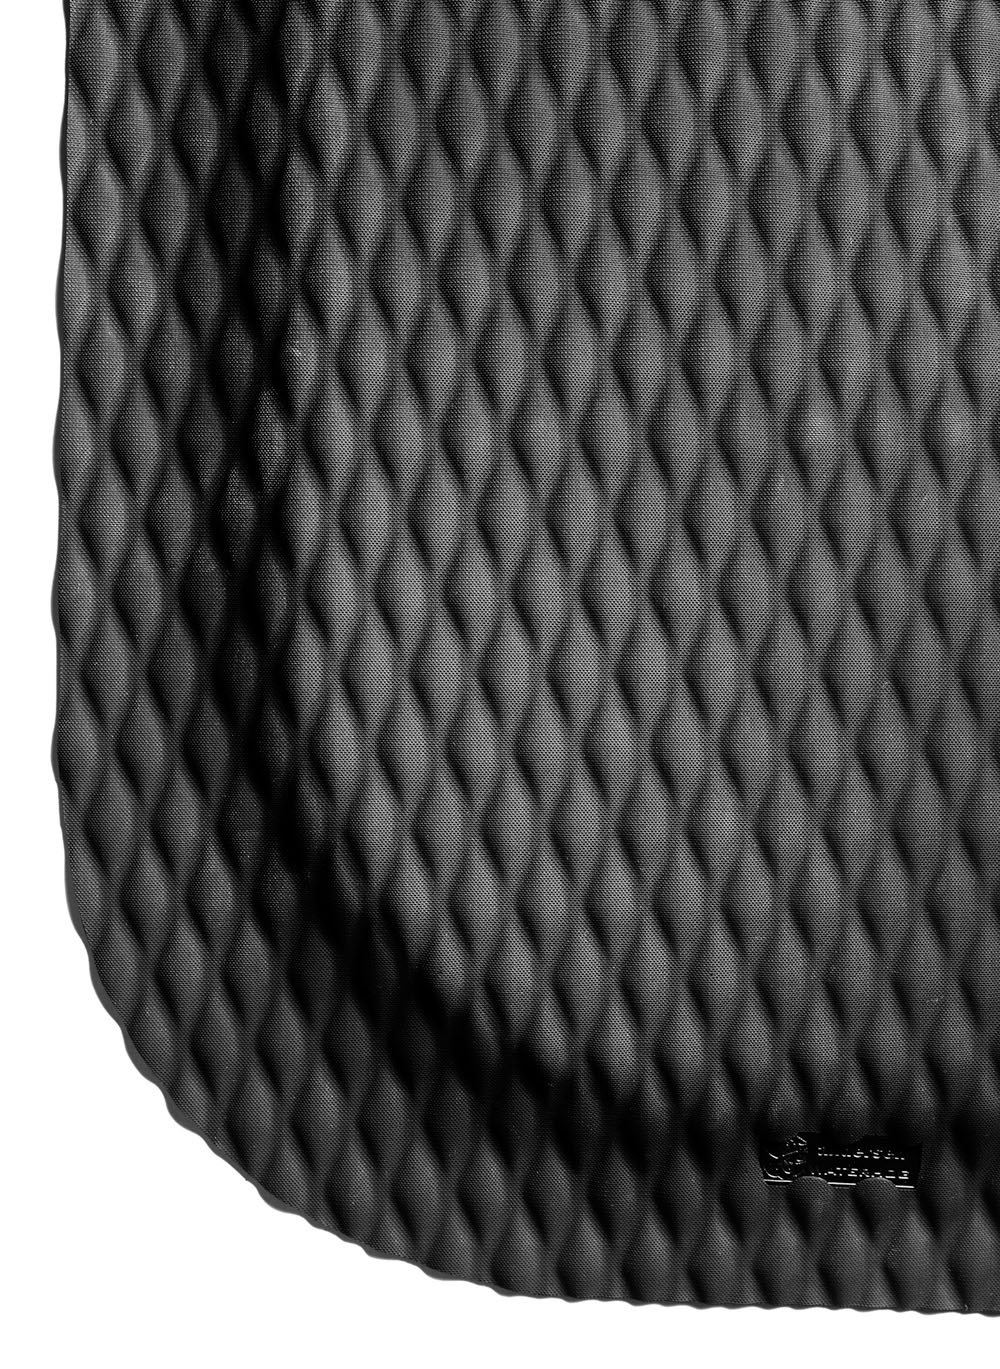 Hog Heaven Ergonomic Industrial-Grade Anti-Fatigue Mat 7 8 6 Length x 4 Width x Black by M A Matting